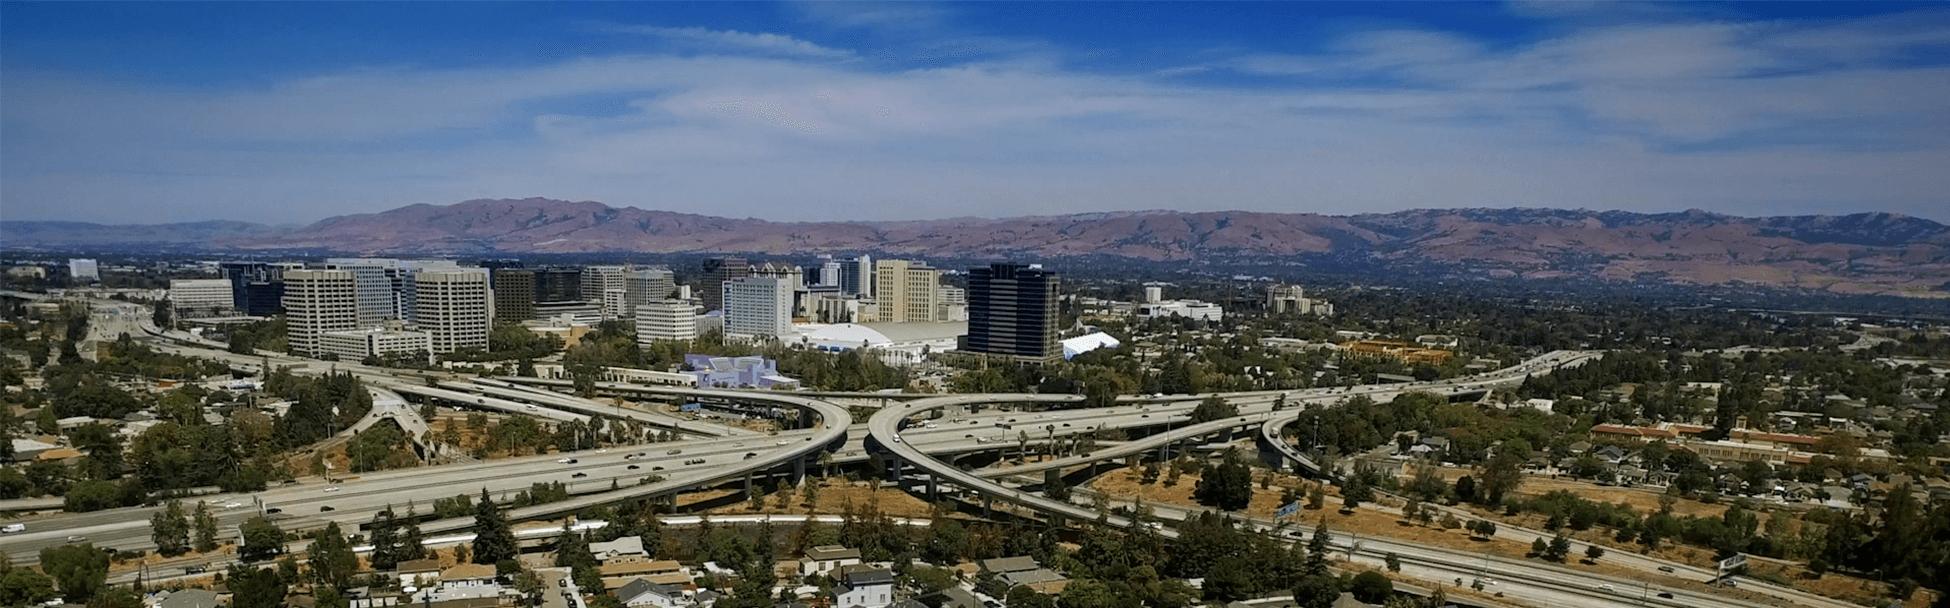 Lockheed Martin Space in Sunnyvale